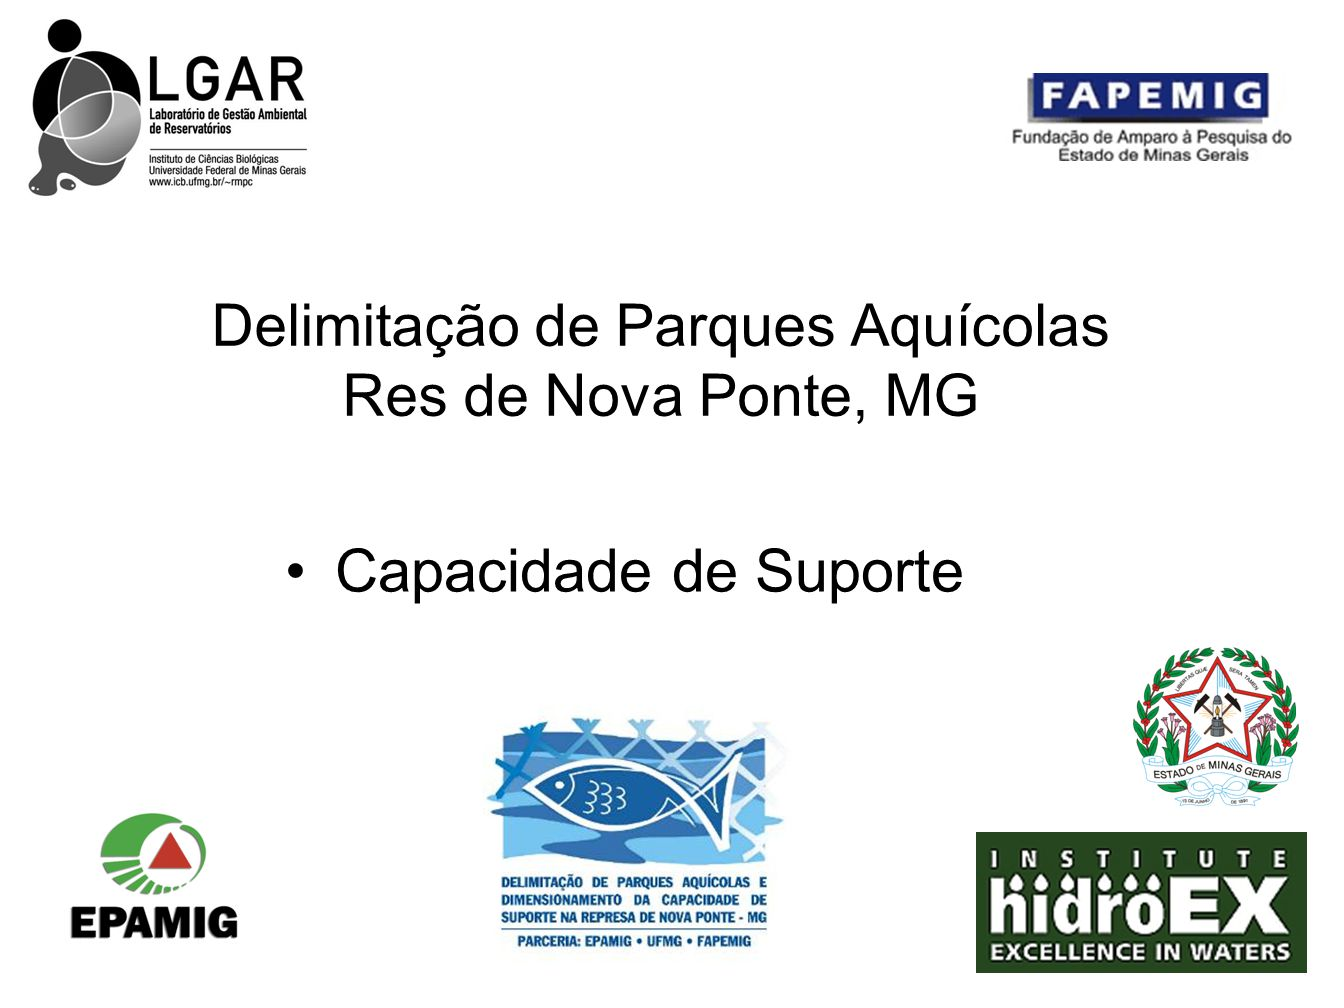 Delimitação de Parques Aquícolas Res de Nova Ponte, MG